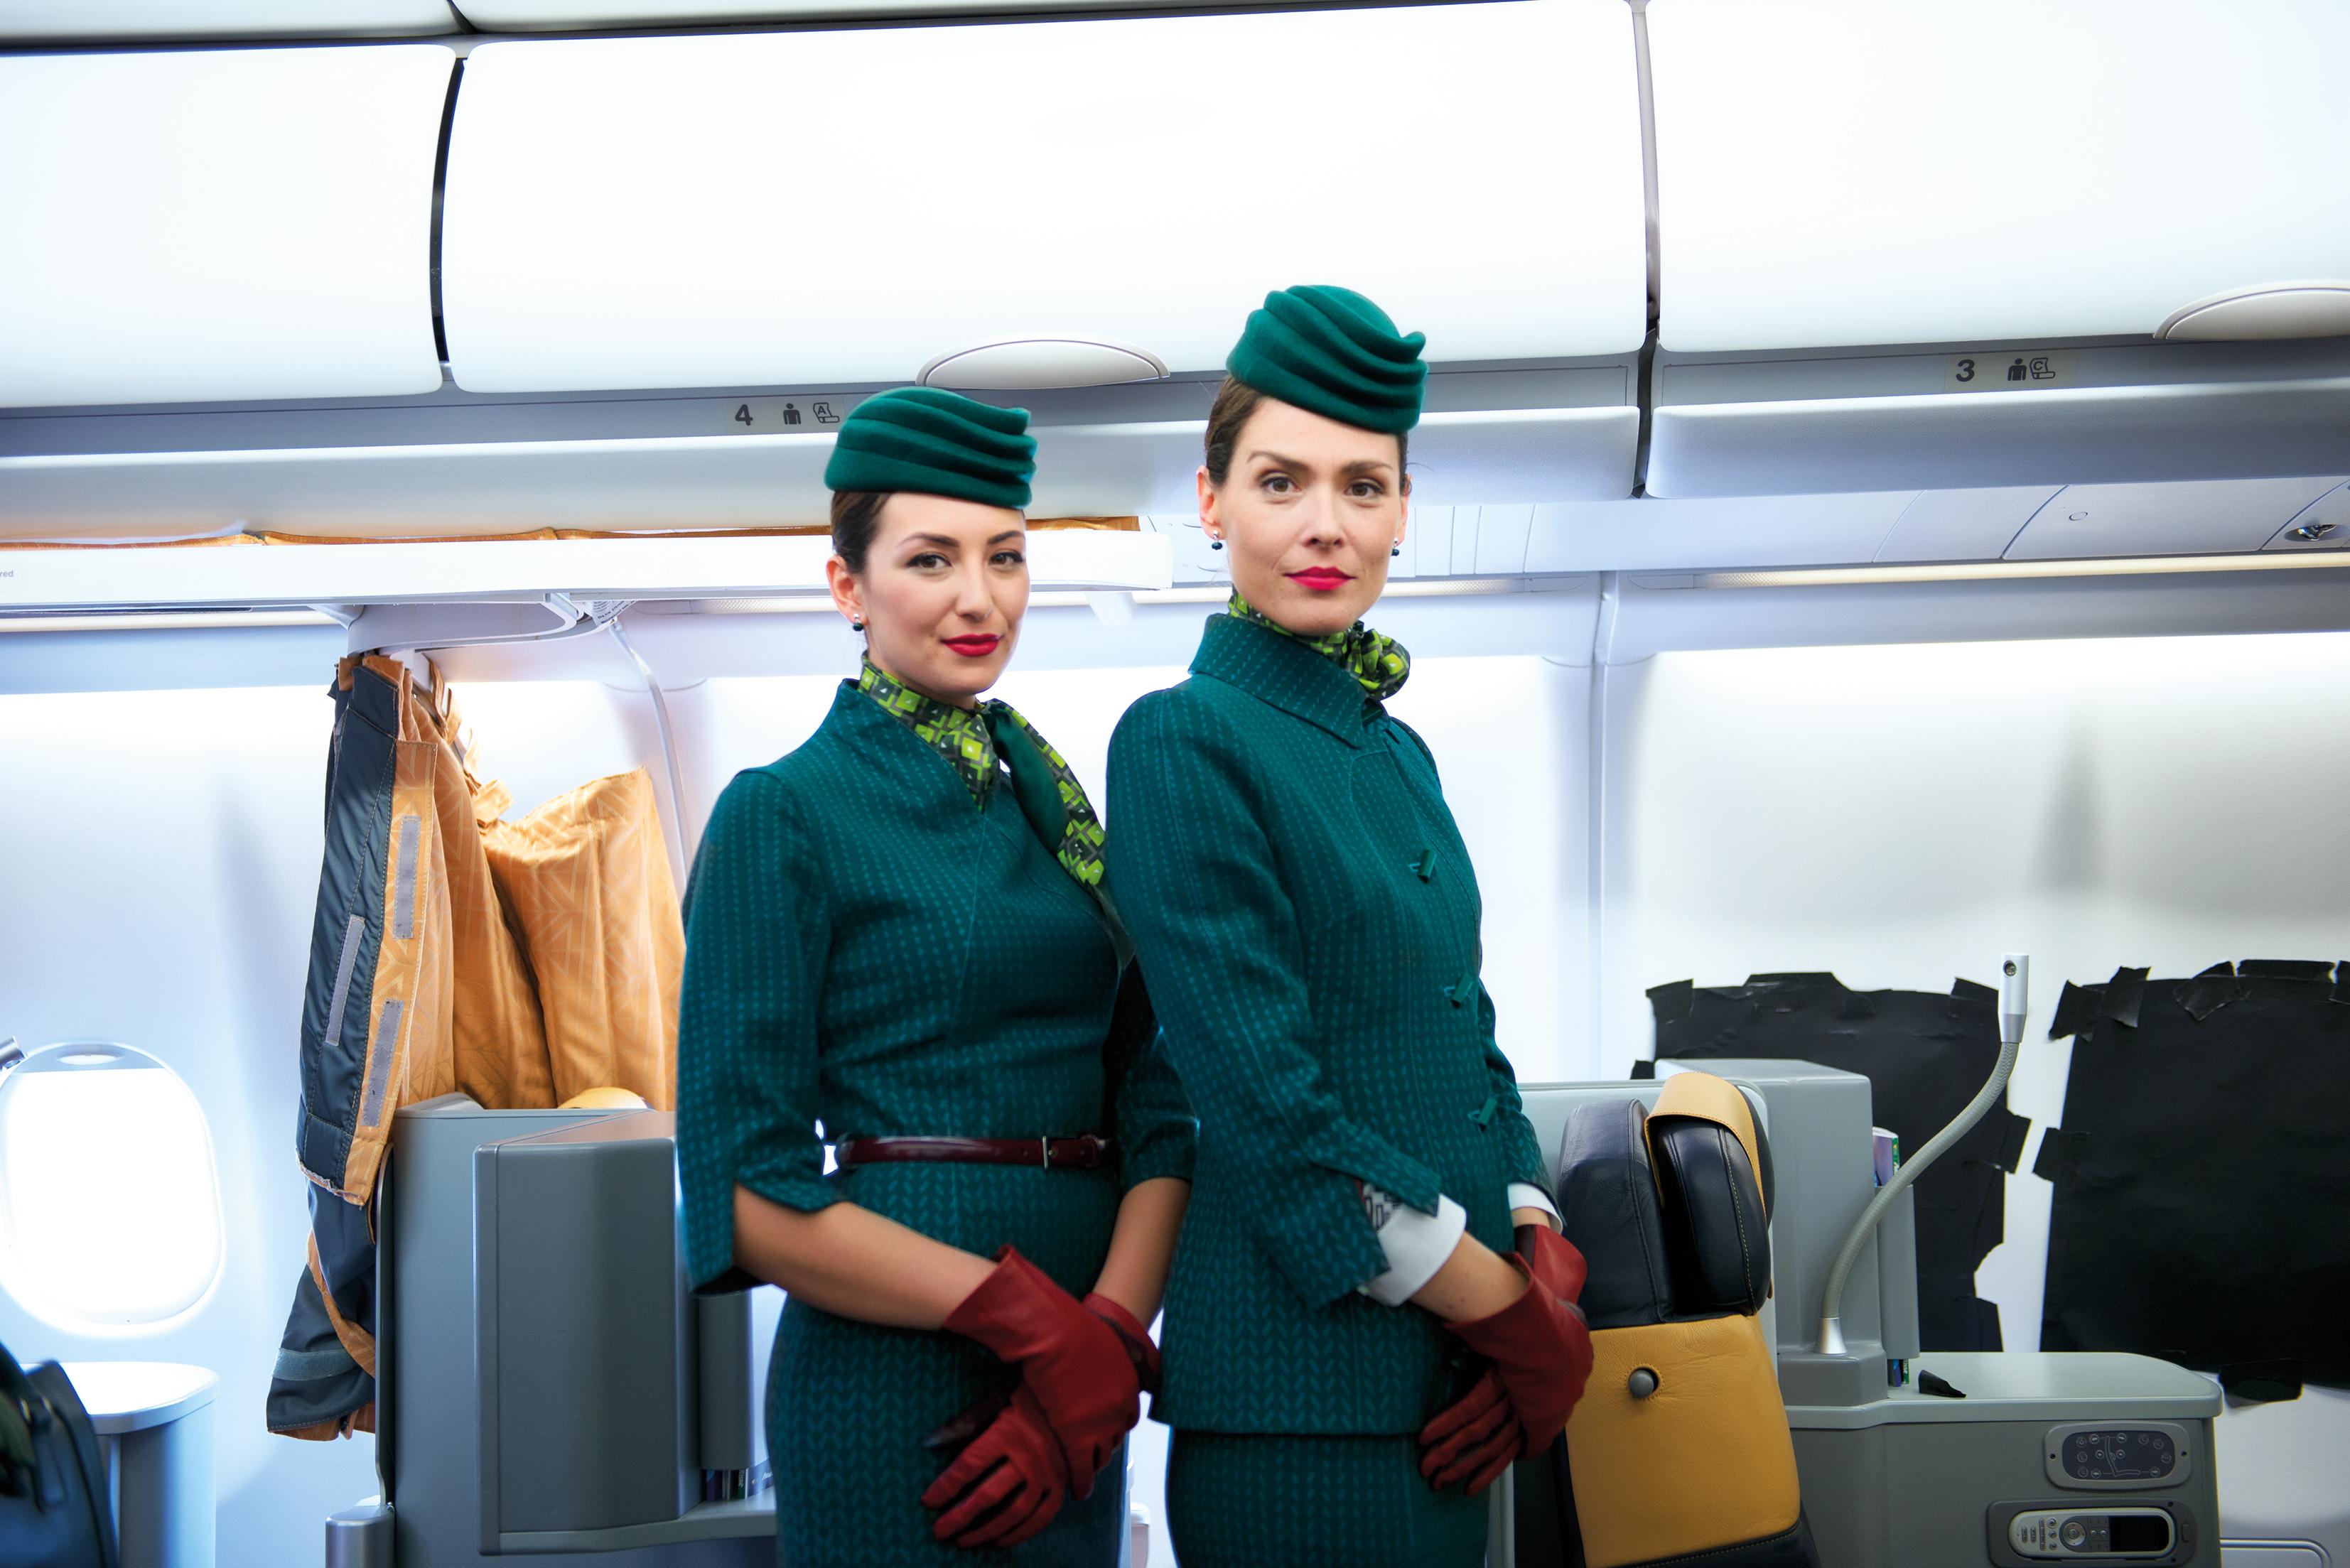 Kabinepersonale fra  Alitalia. Foto: Alitalia